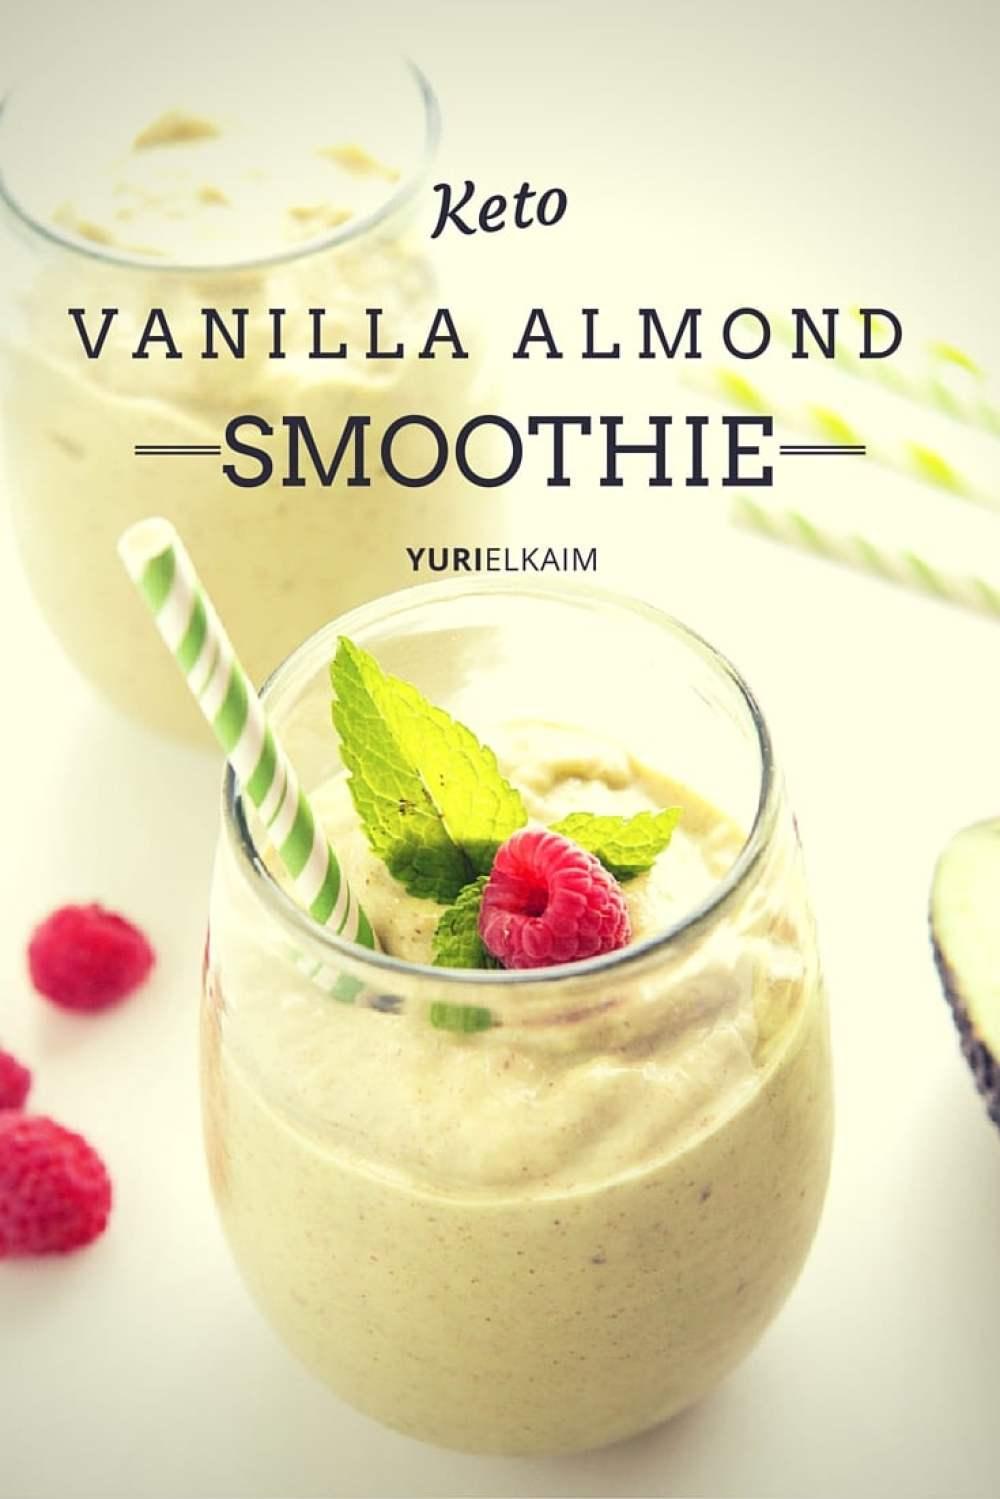 Vanilla Almond Keto Protein Shake | Yuri Elkaim